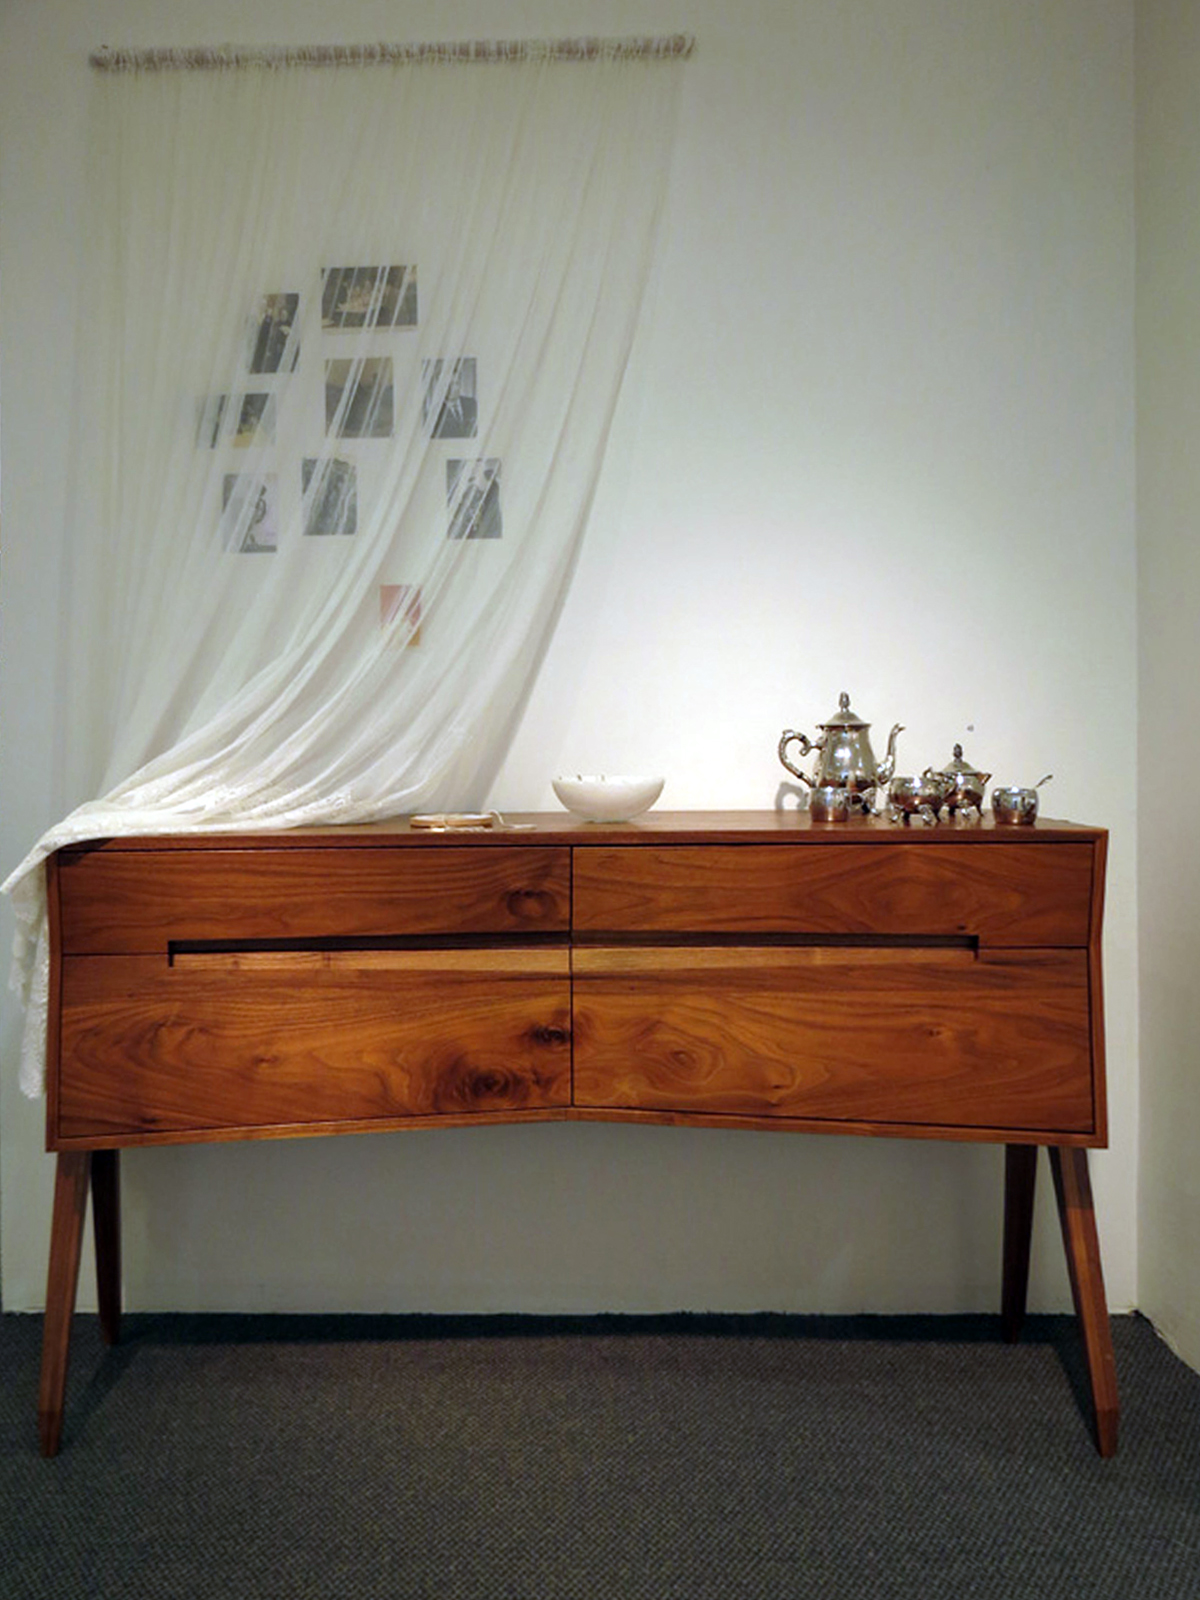 43. Expectant console in installation , Penelope Forlano, American Black Walnut,$8450 (personal ephemera NFS)